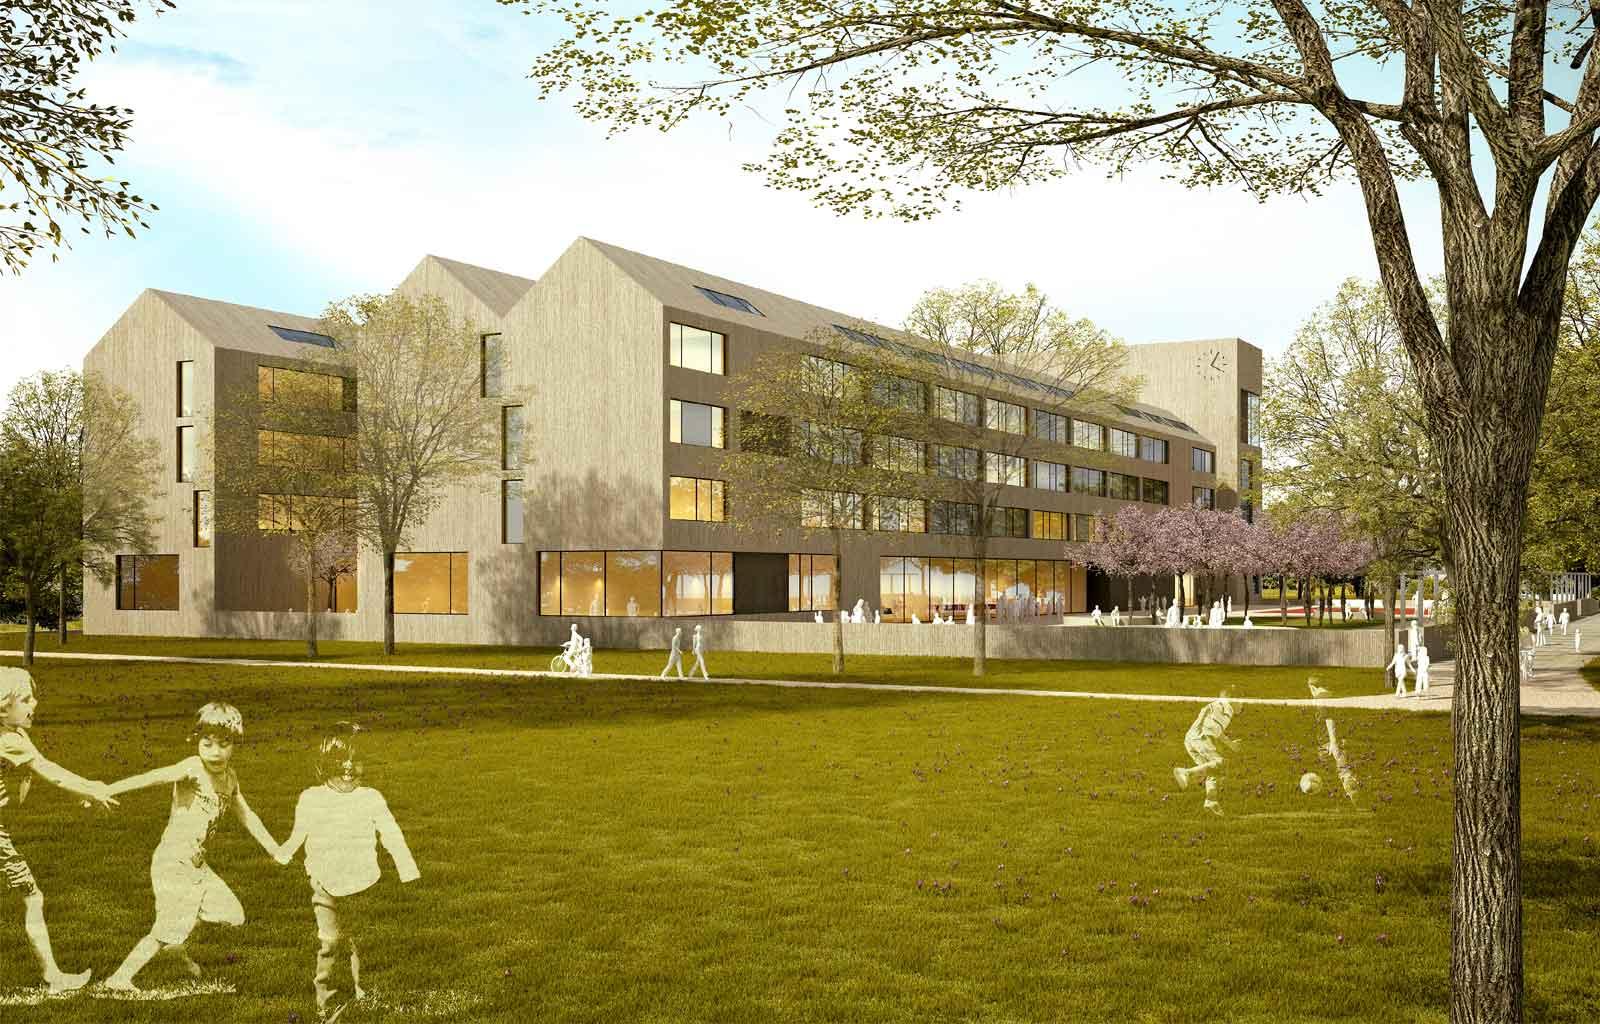 Wettbewerb | Neubau Gesamtschule Nippes Ossietzkystraße in Köln ...